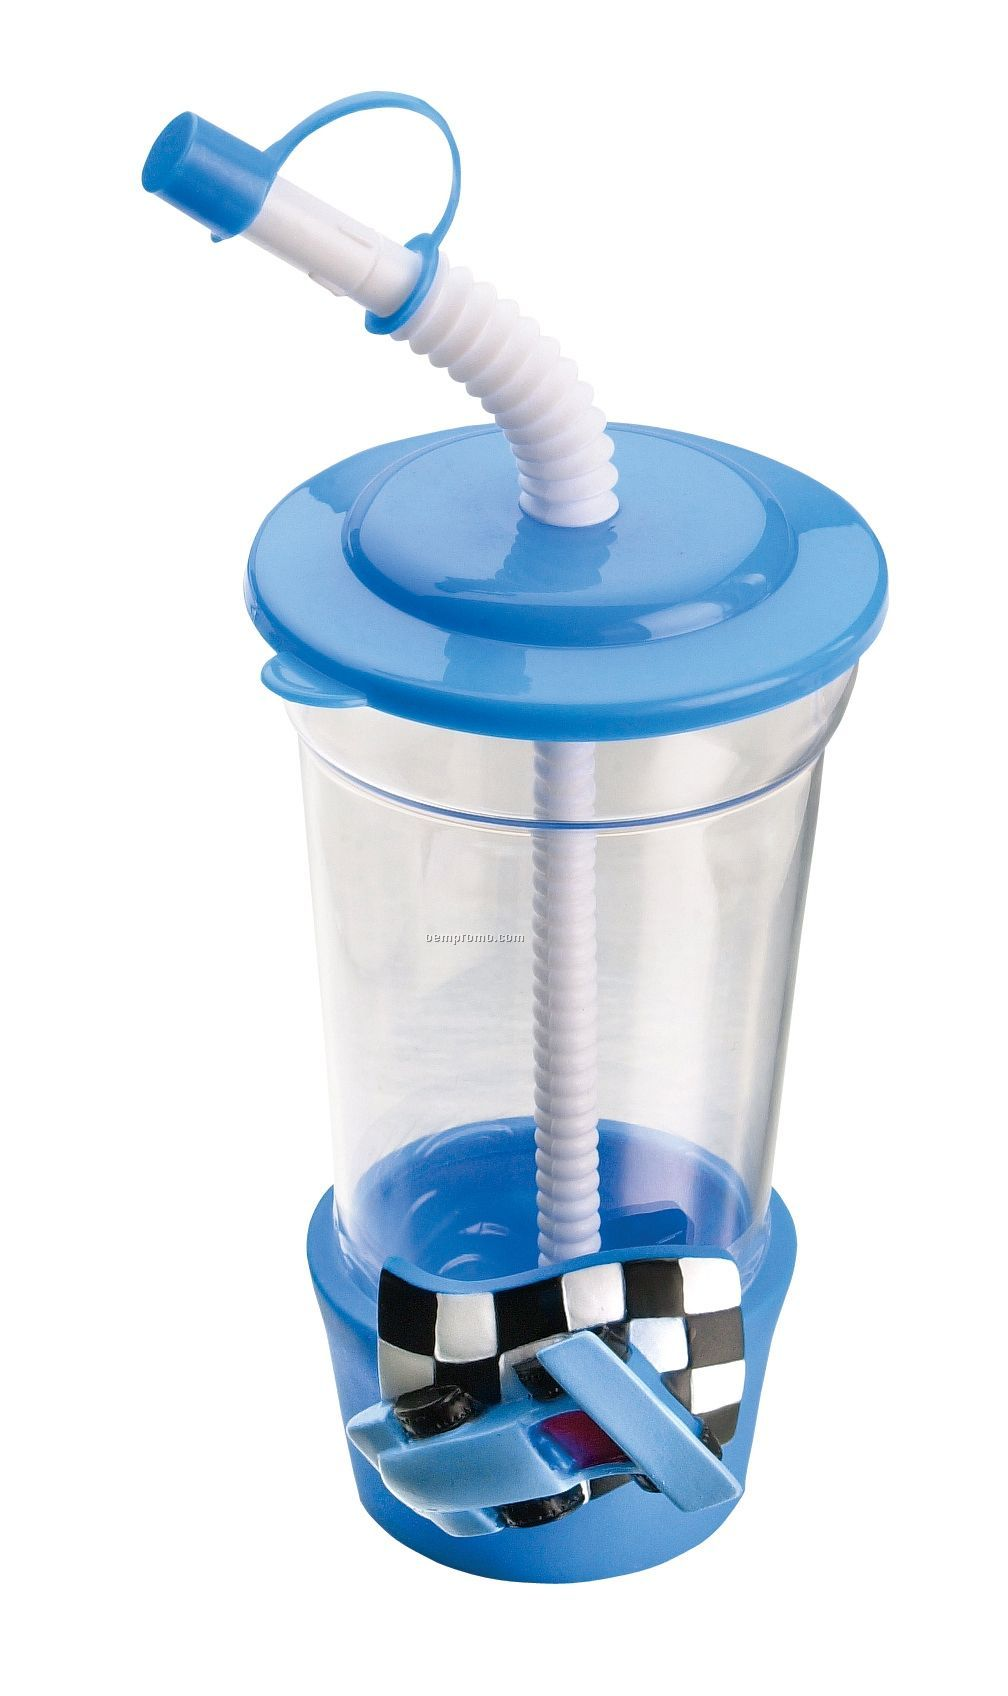 scarlett johansson cup size